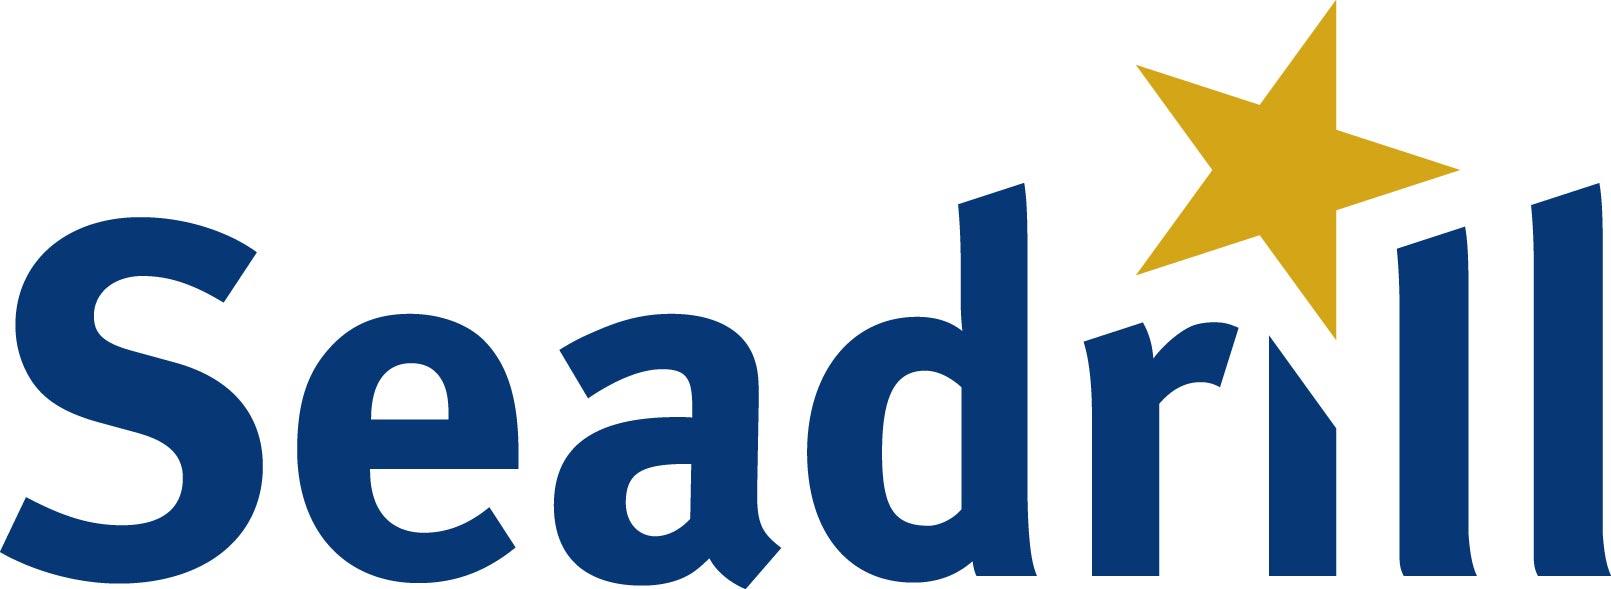 Seadrill Ltd logo